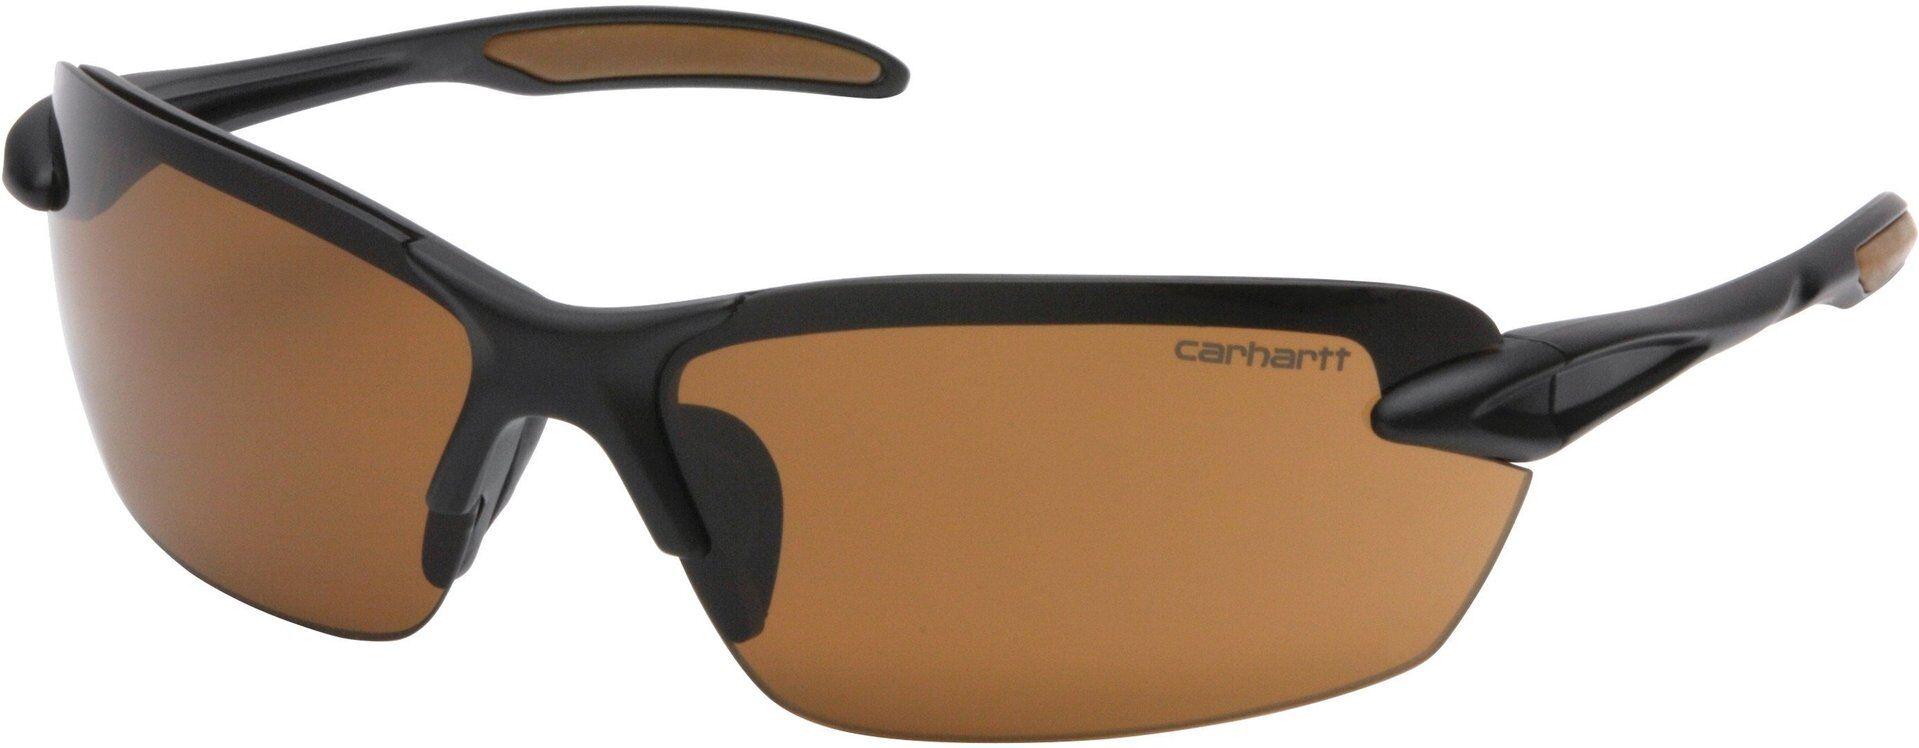 Carhartt Spokane Safety Glasses Brown